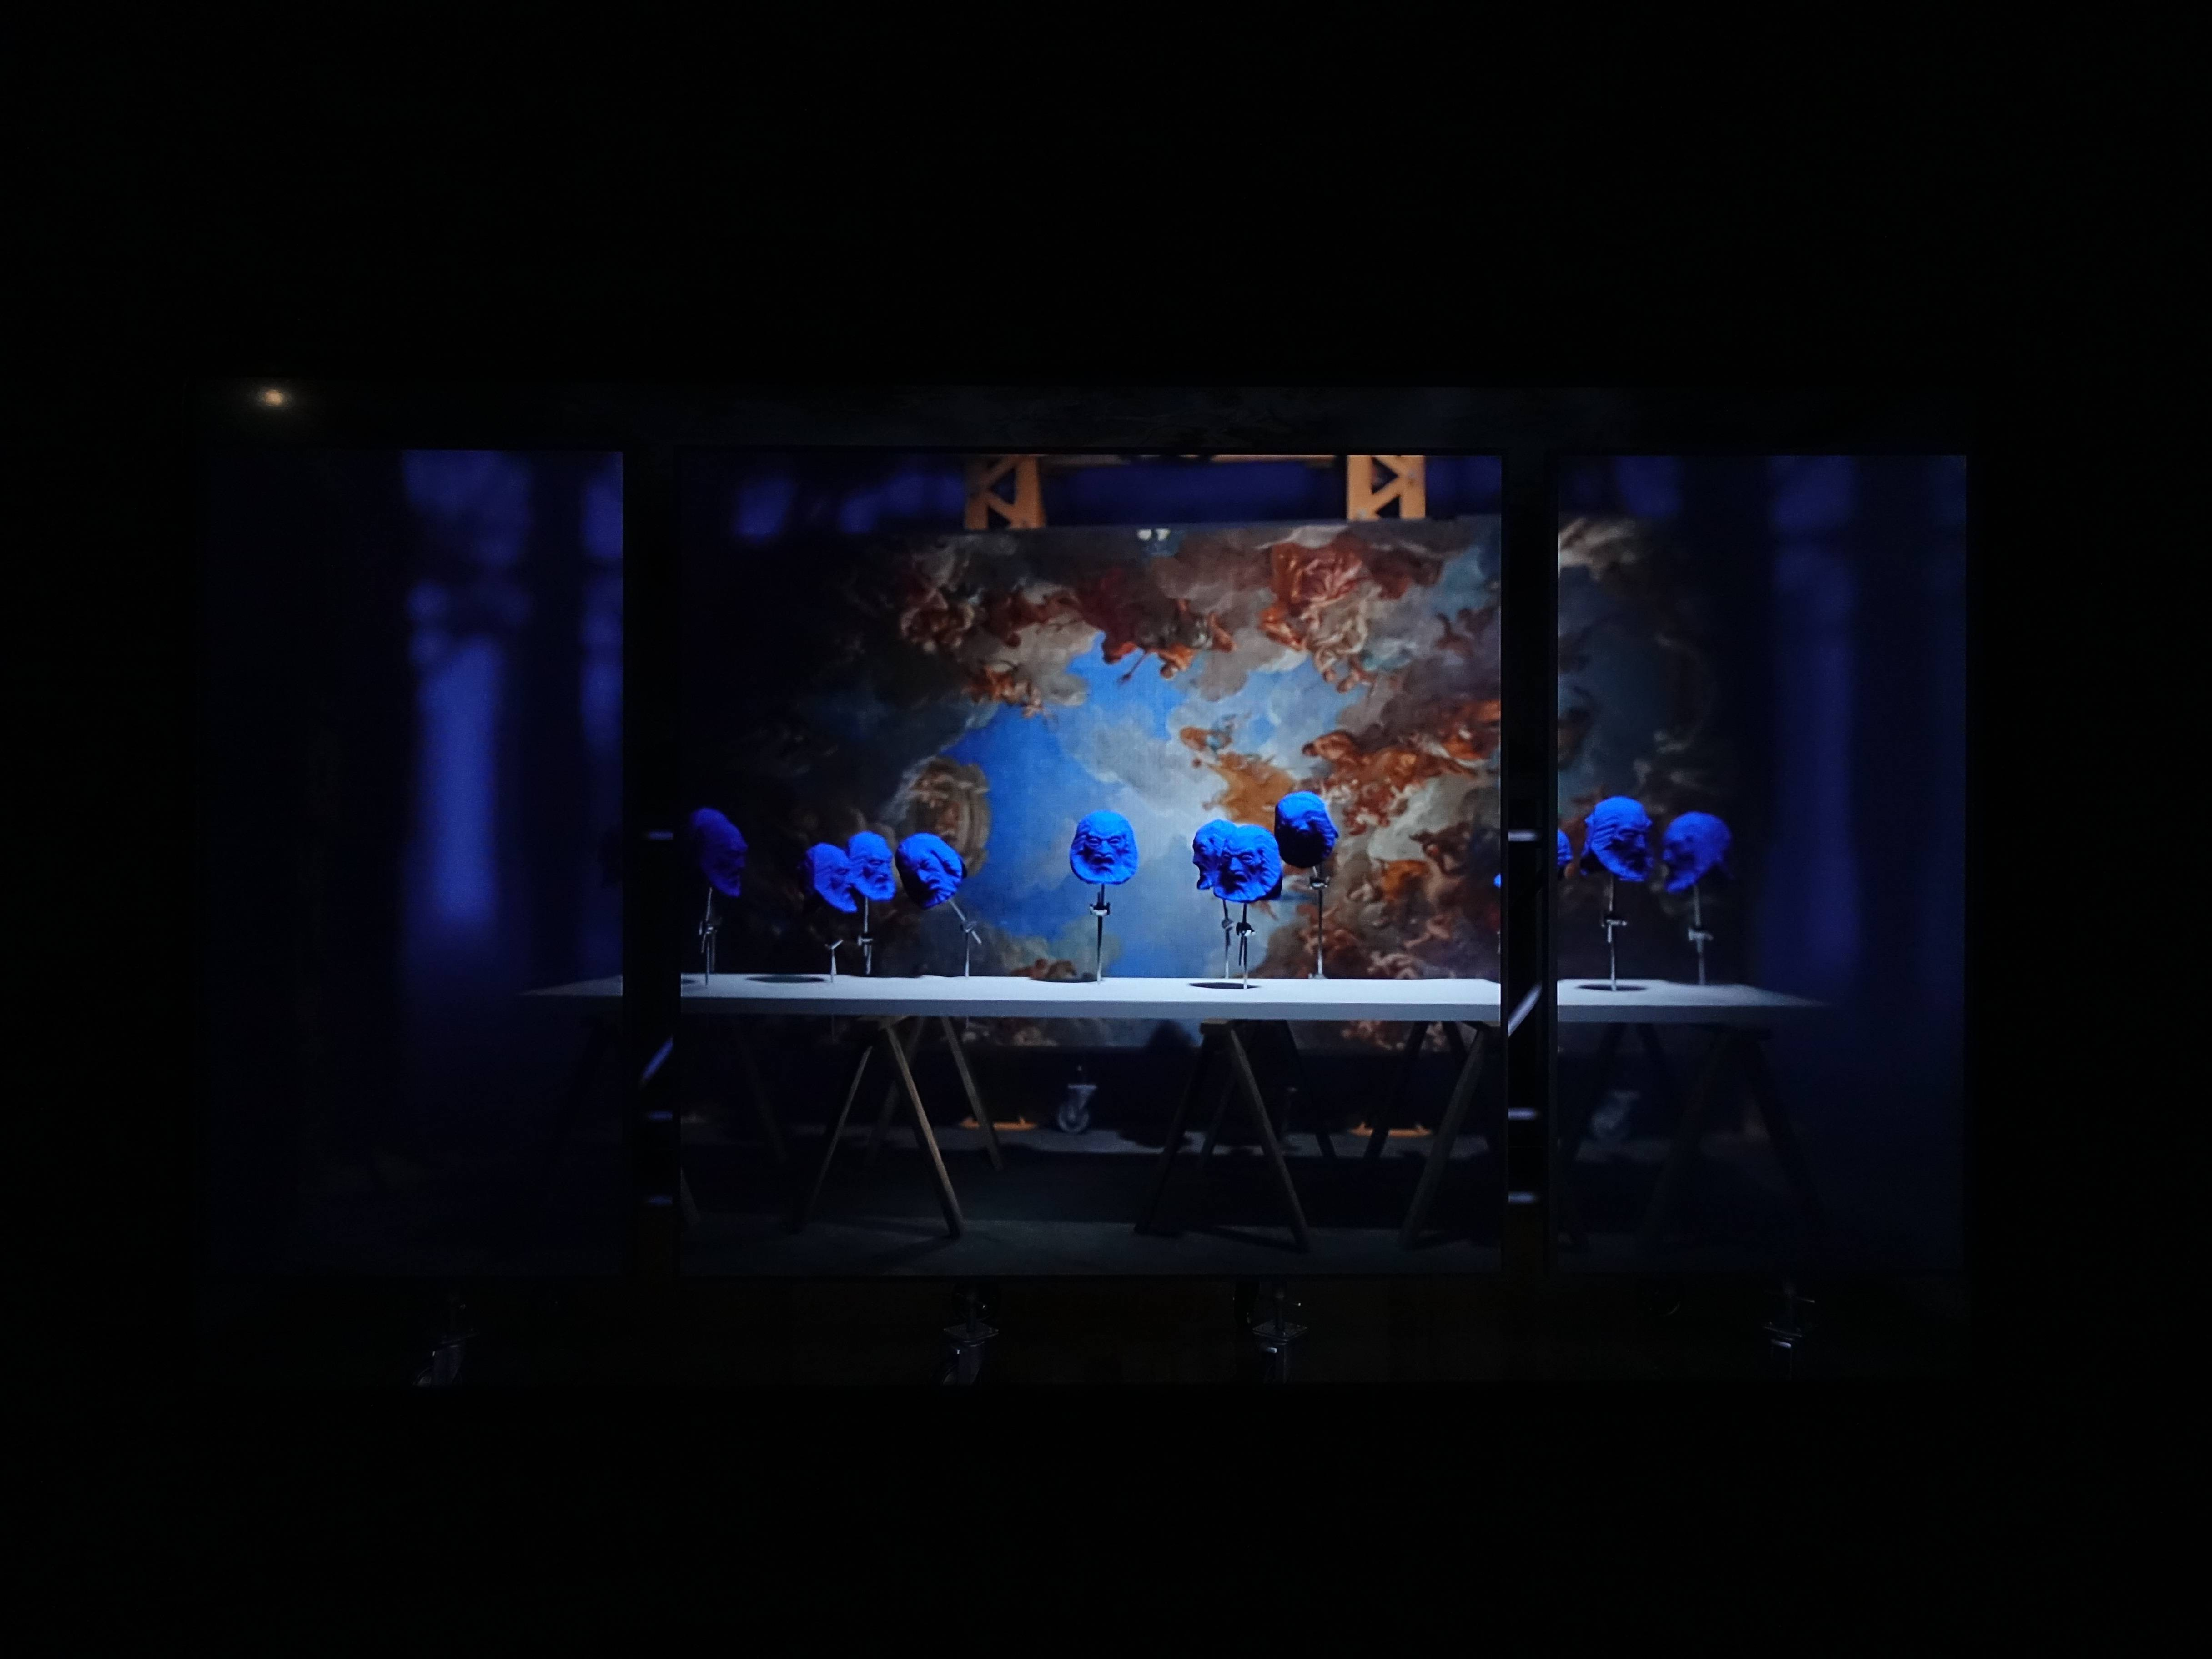 Florian Claar,《聲音的樂章》,06'15,HD video單頻錄像,2017。